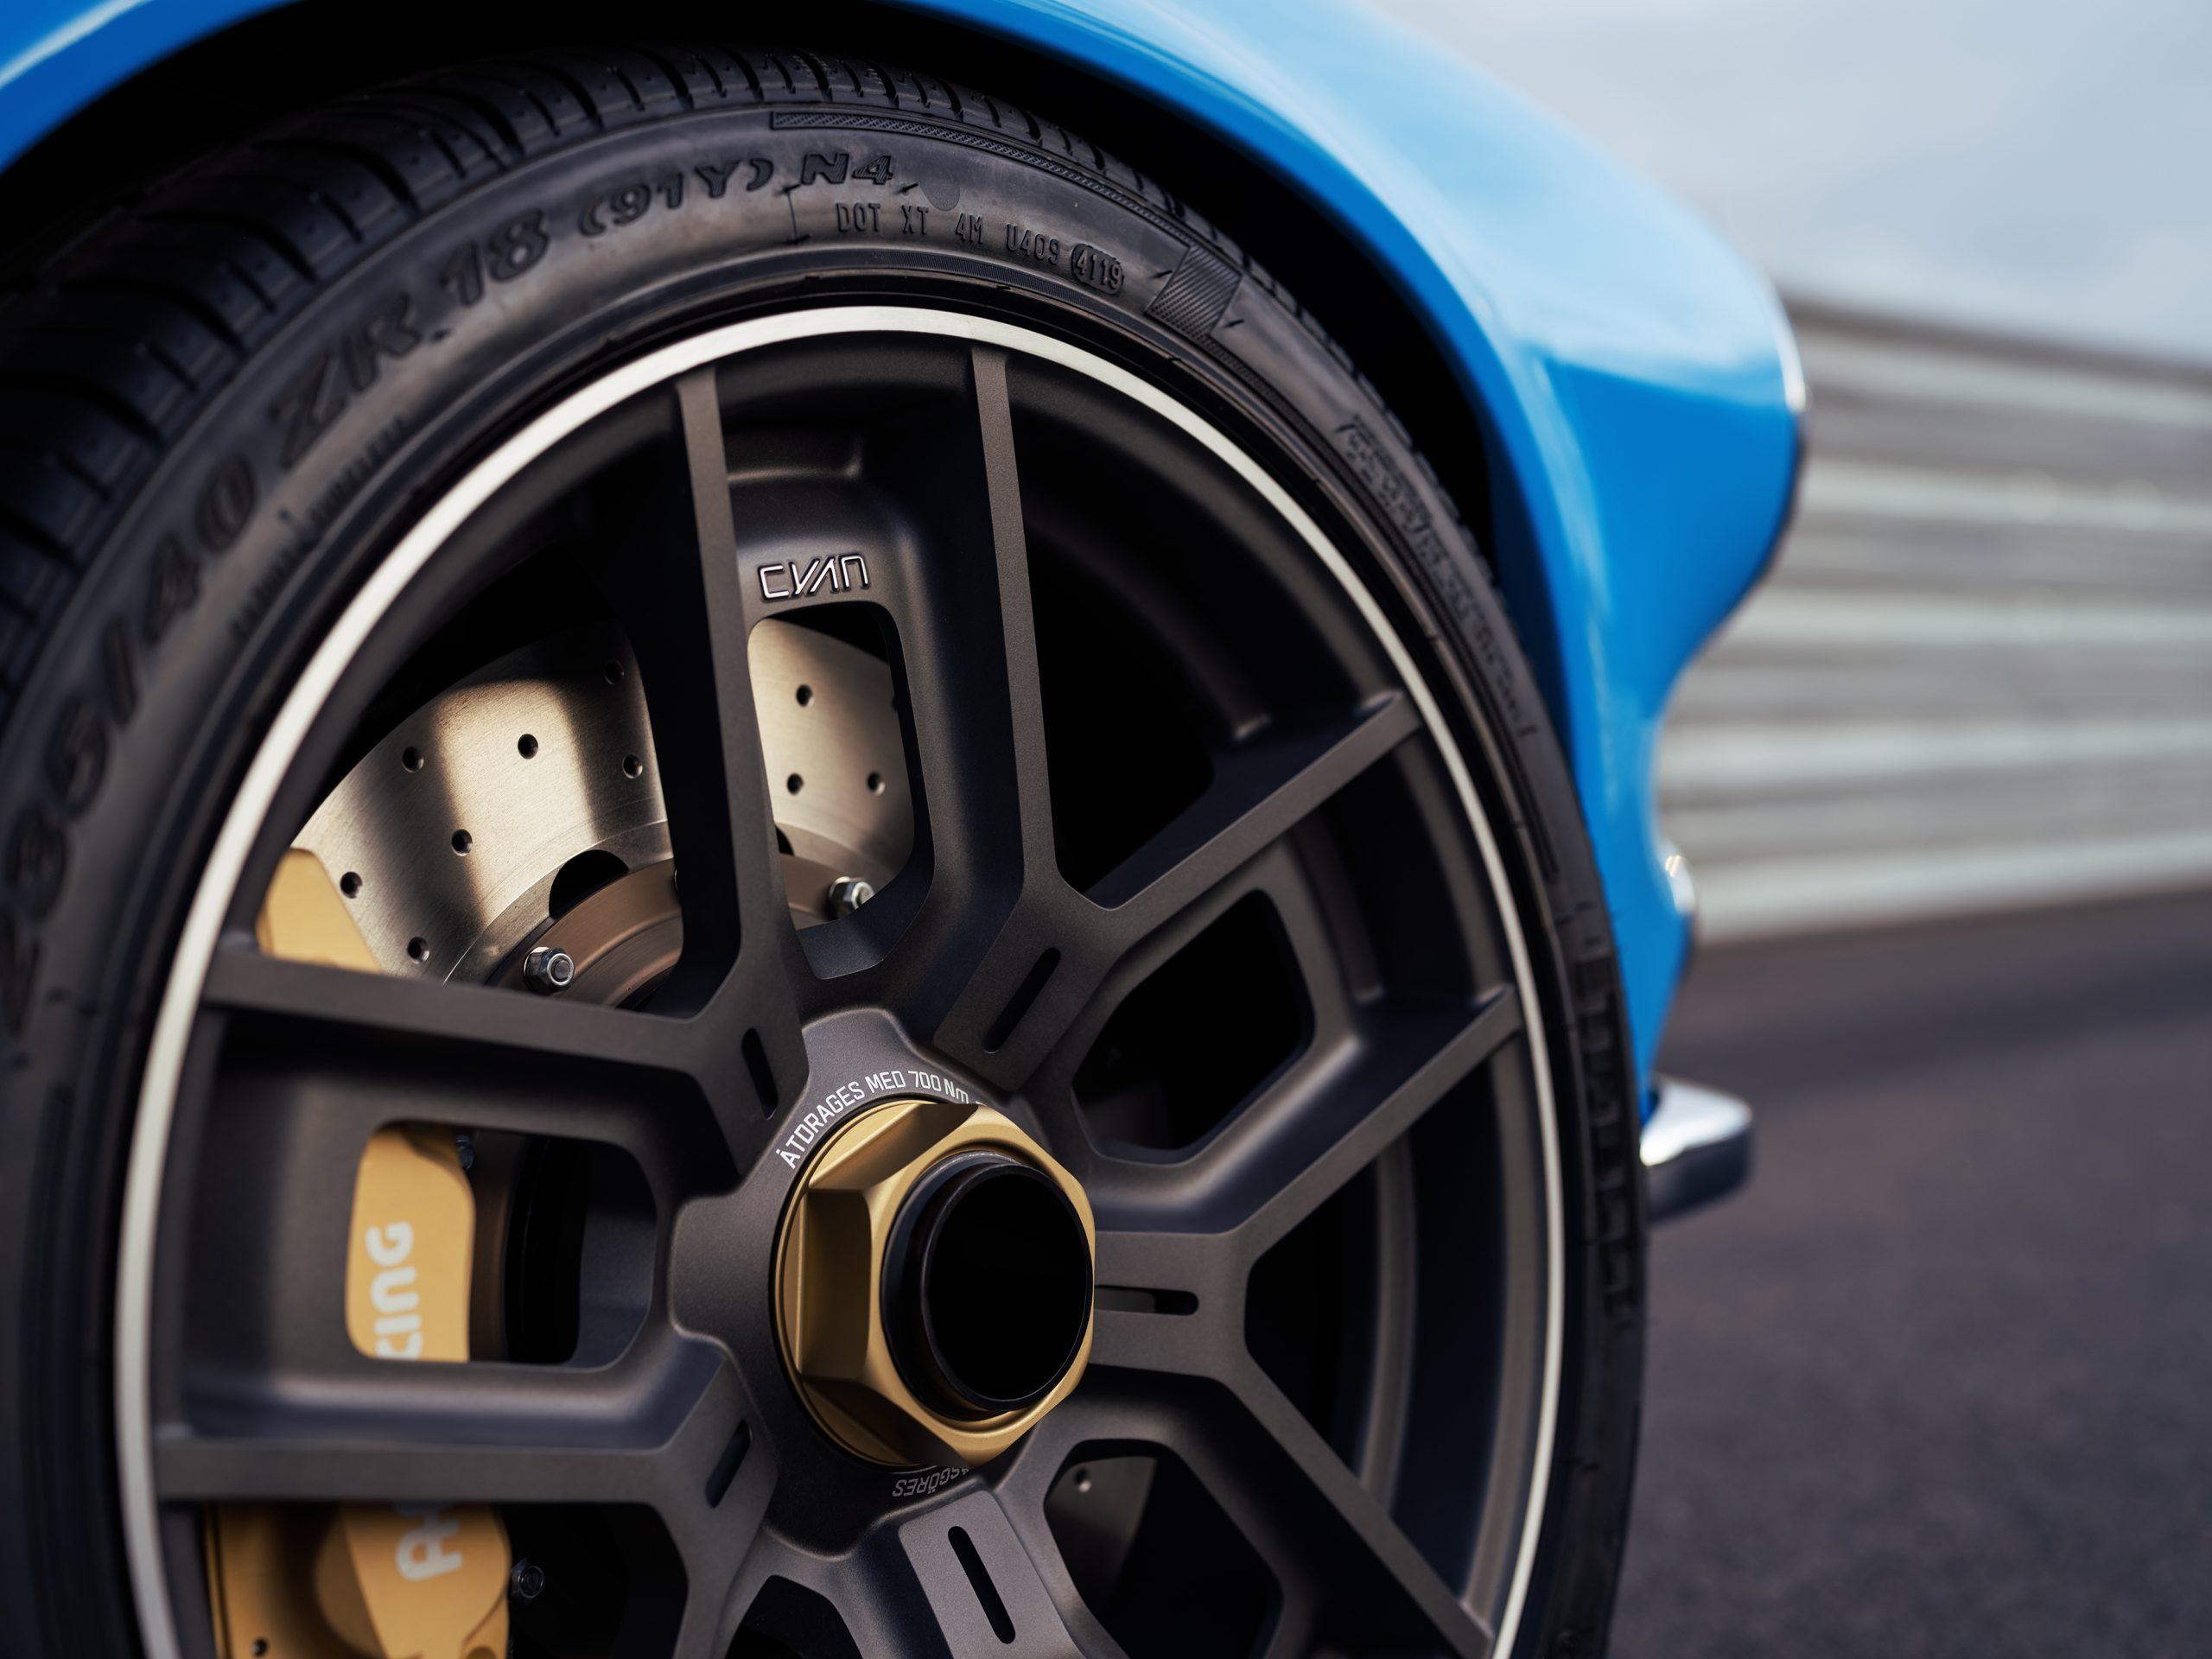 Cyan Racing Volvo P1800 wheel detail